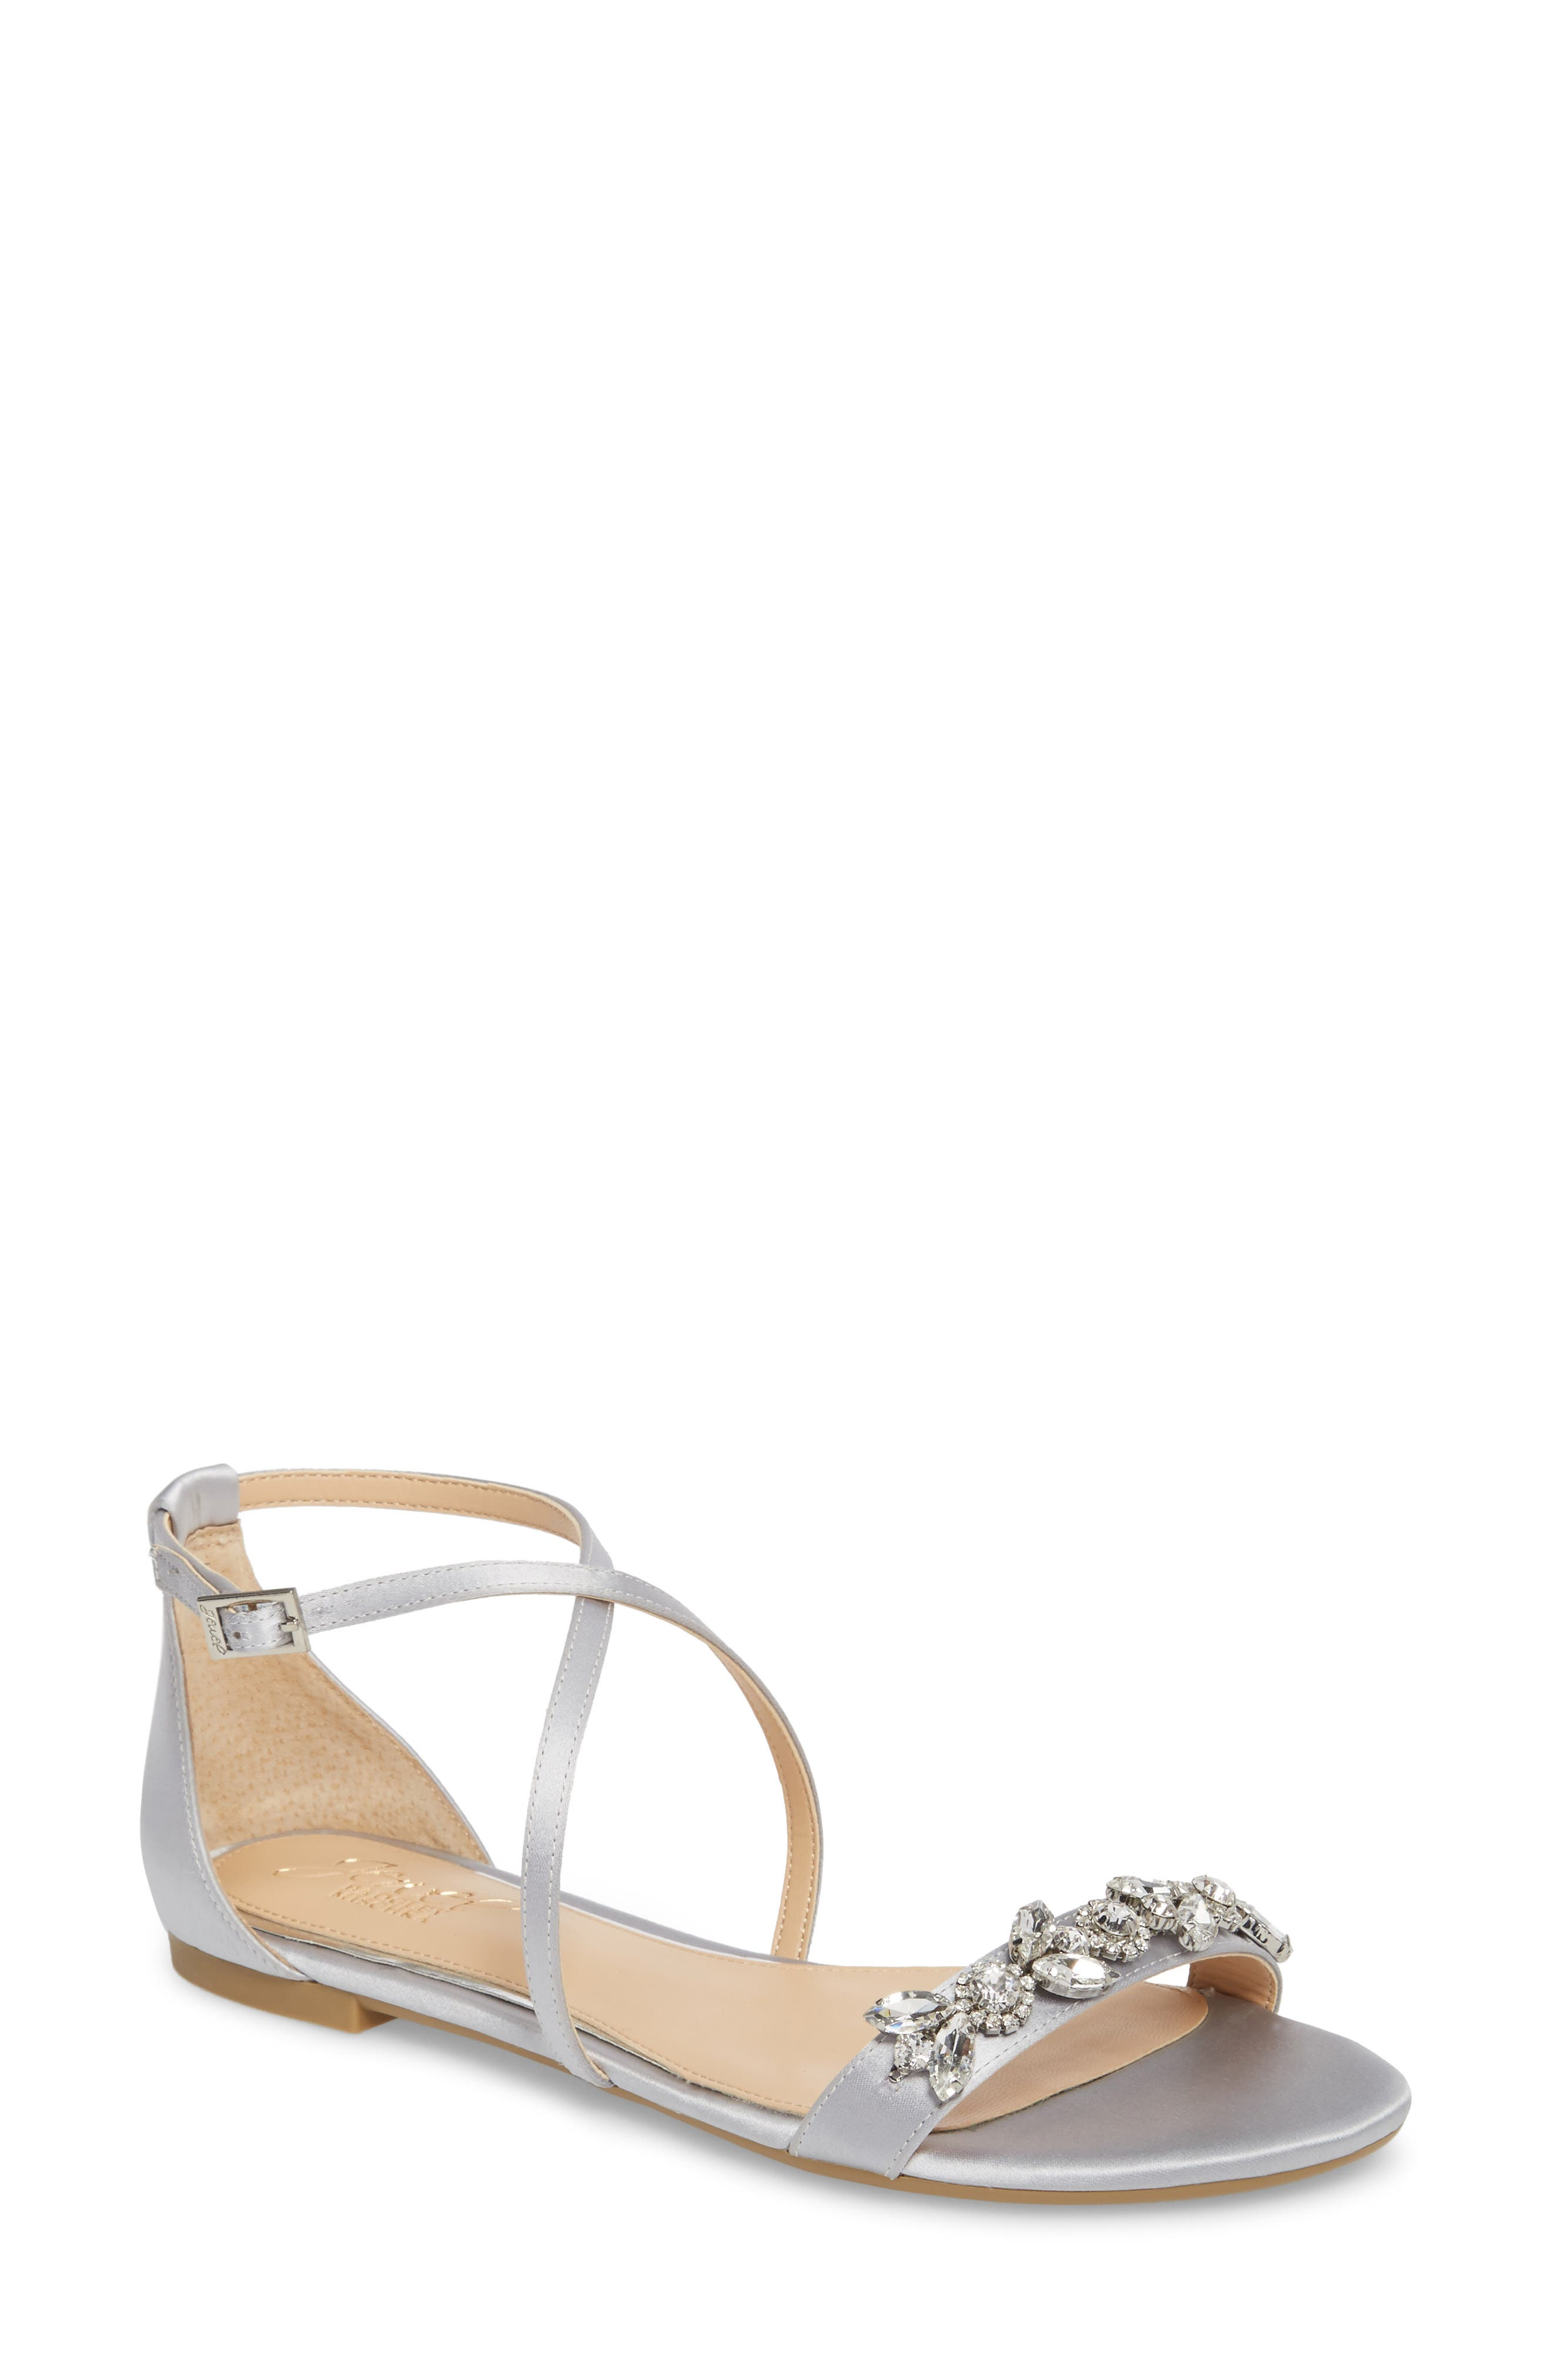 Alternate Image 1 Selected - Jewel Badgley Mischka Tessy Embellished Sandal (Women)